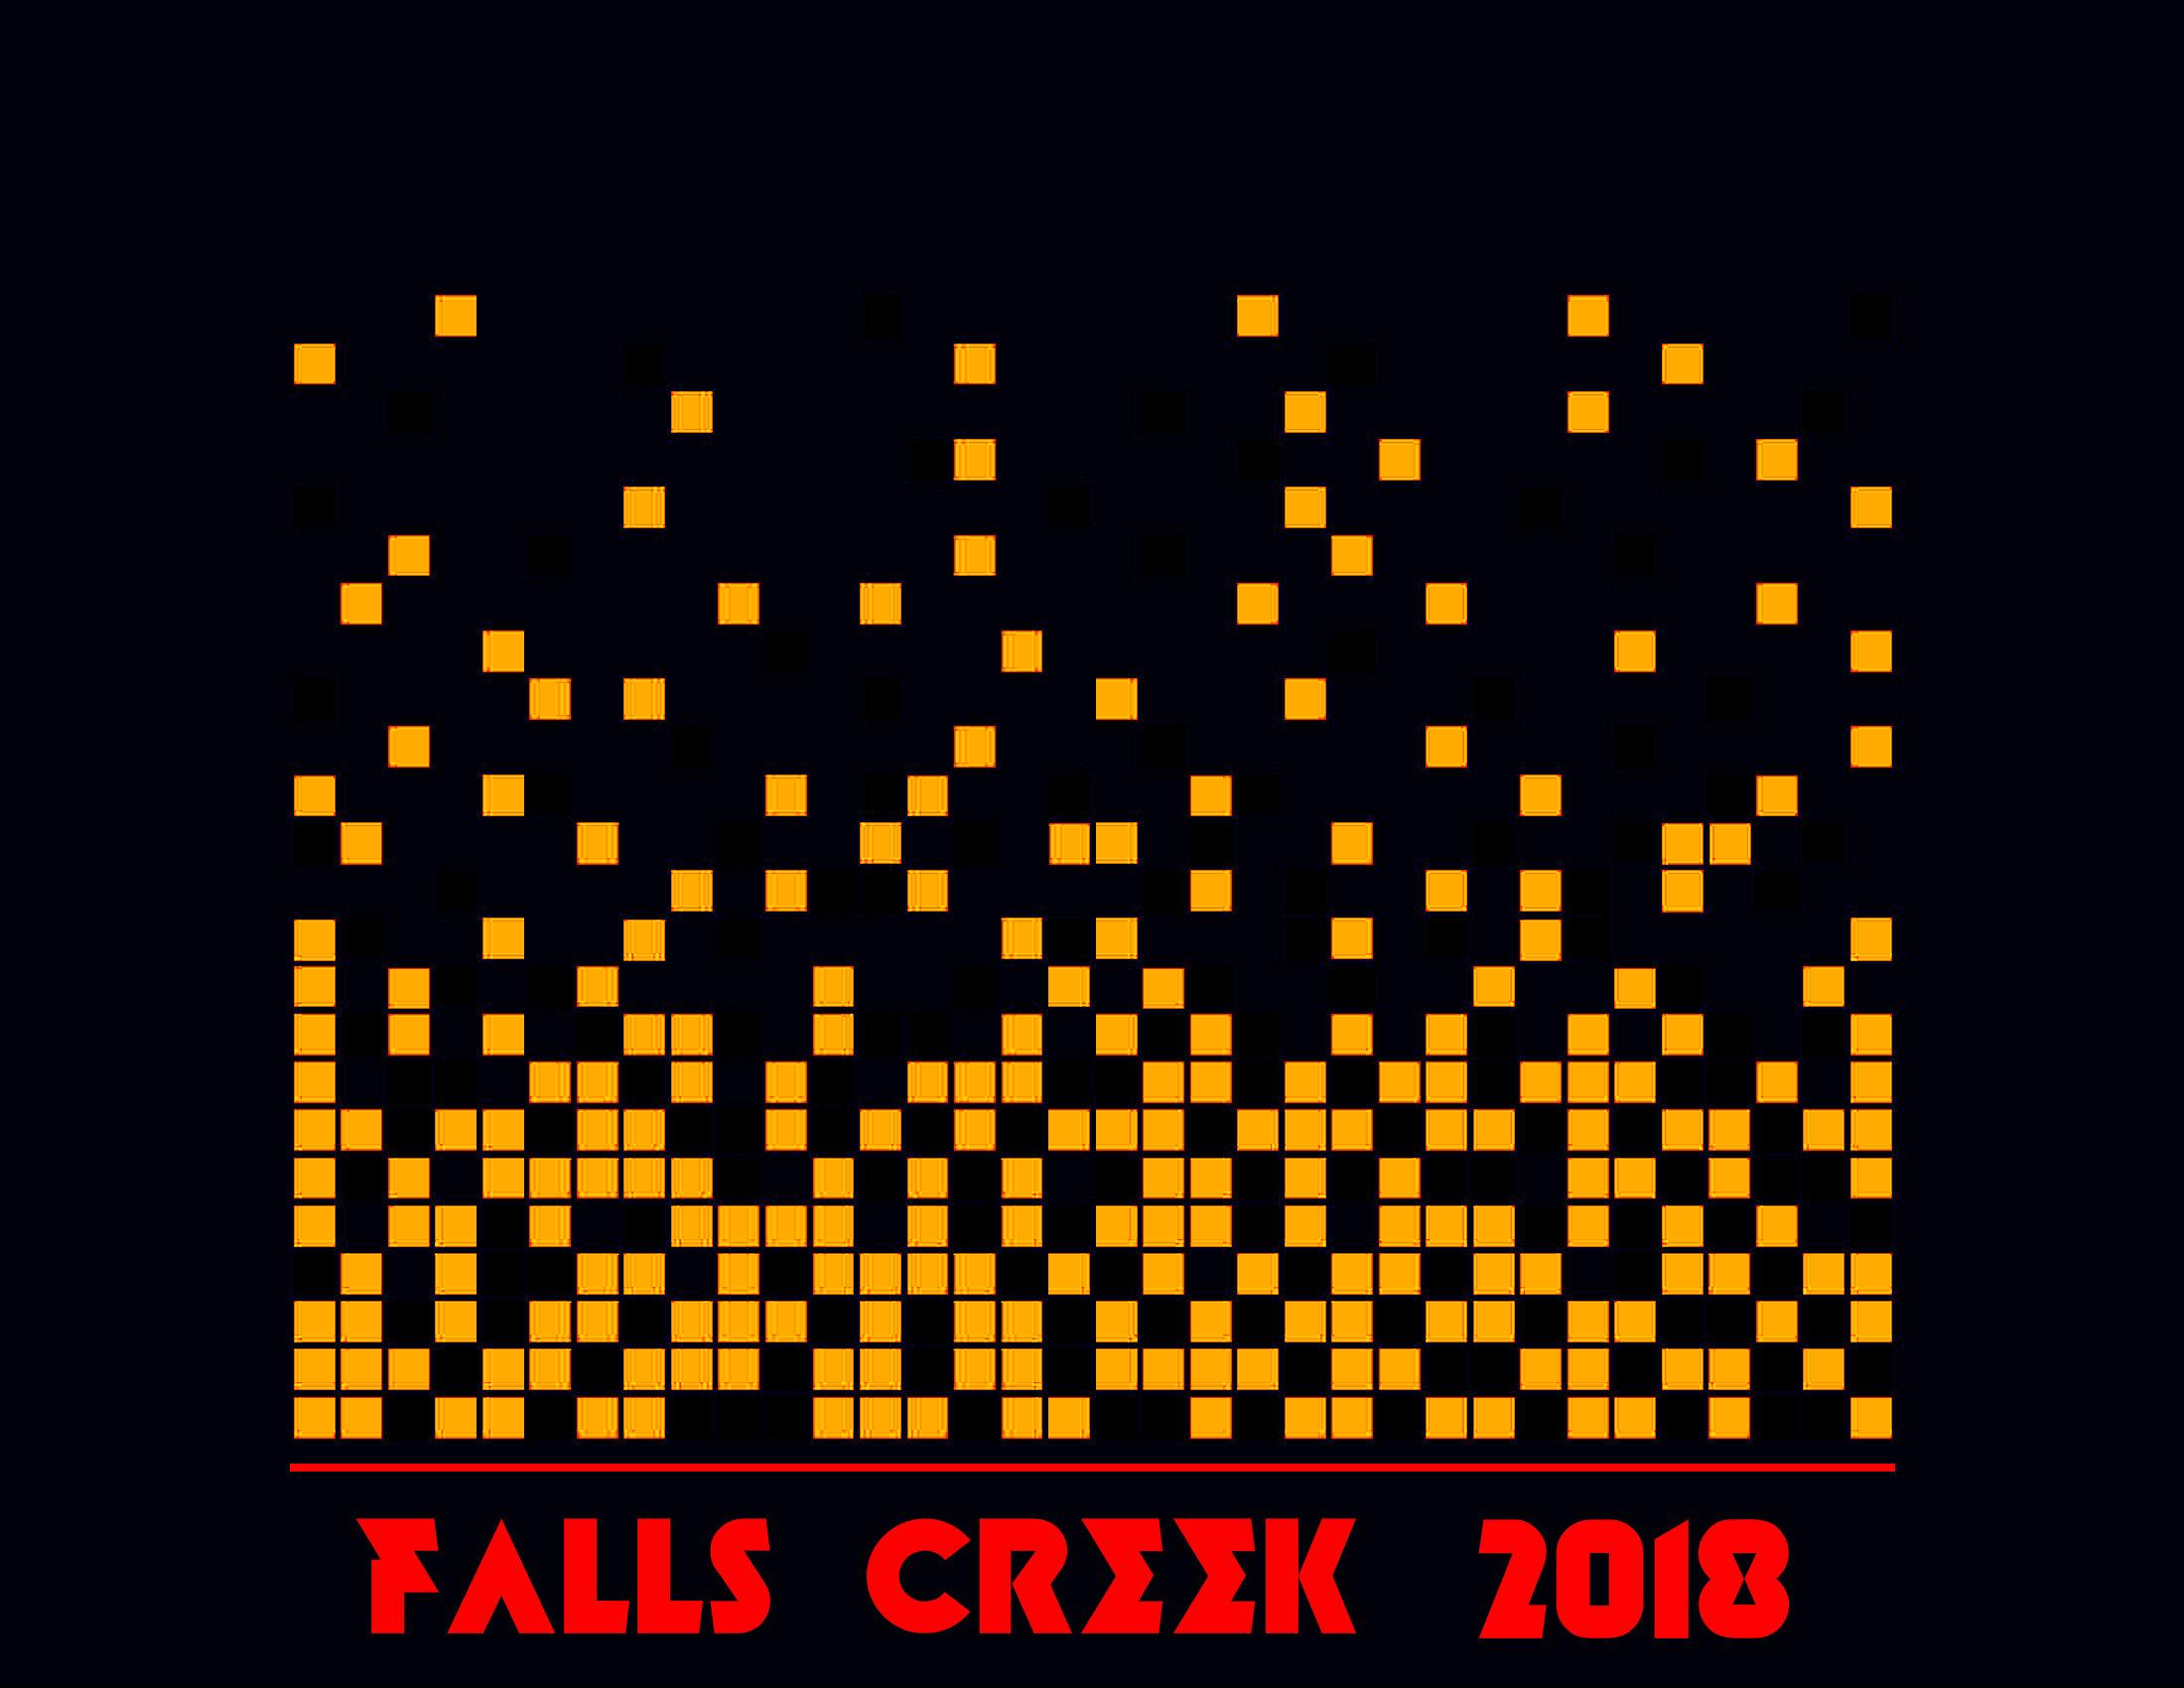 Fallscreekbgv 4